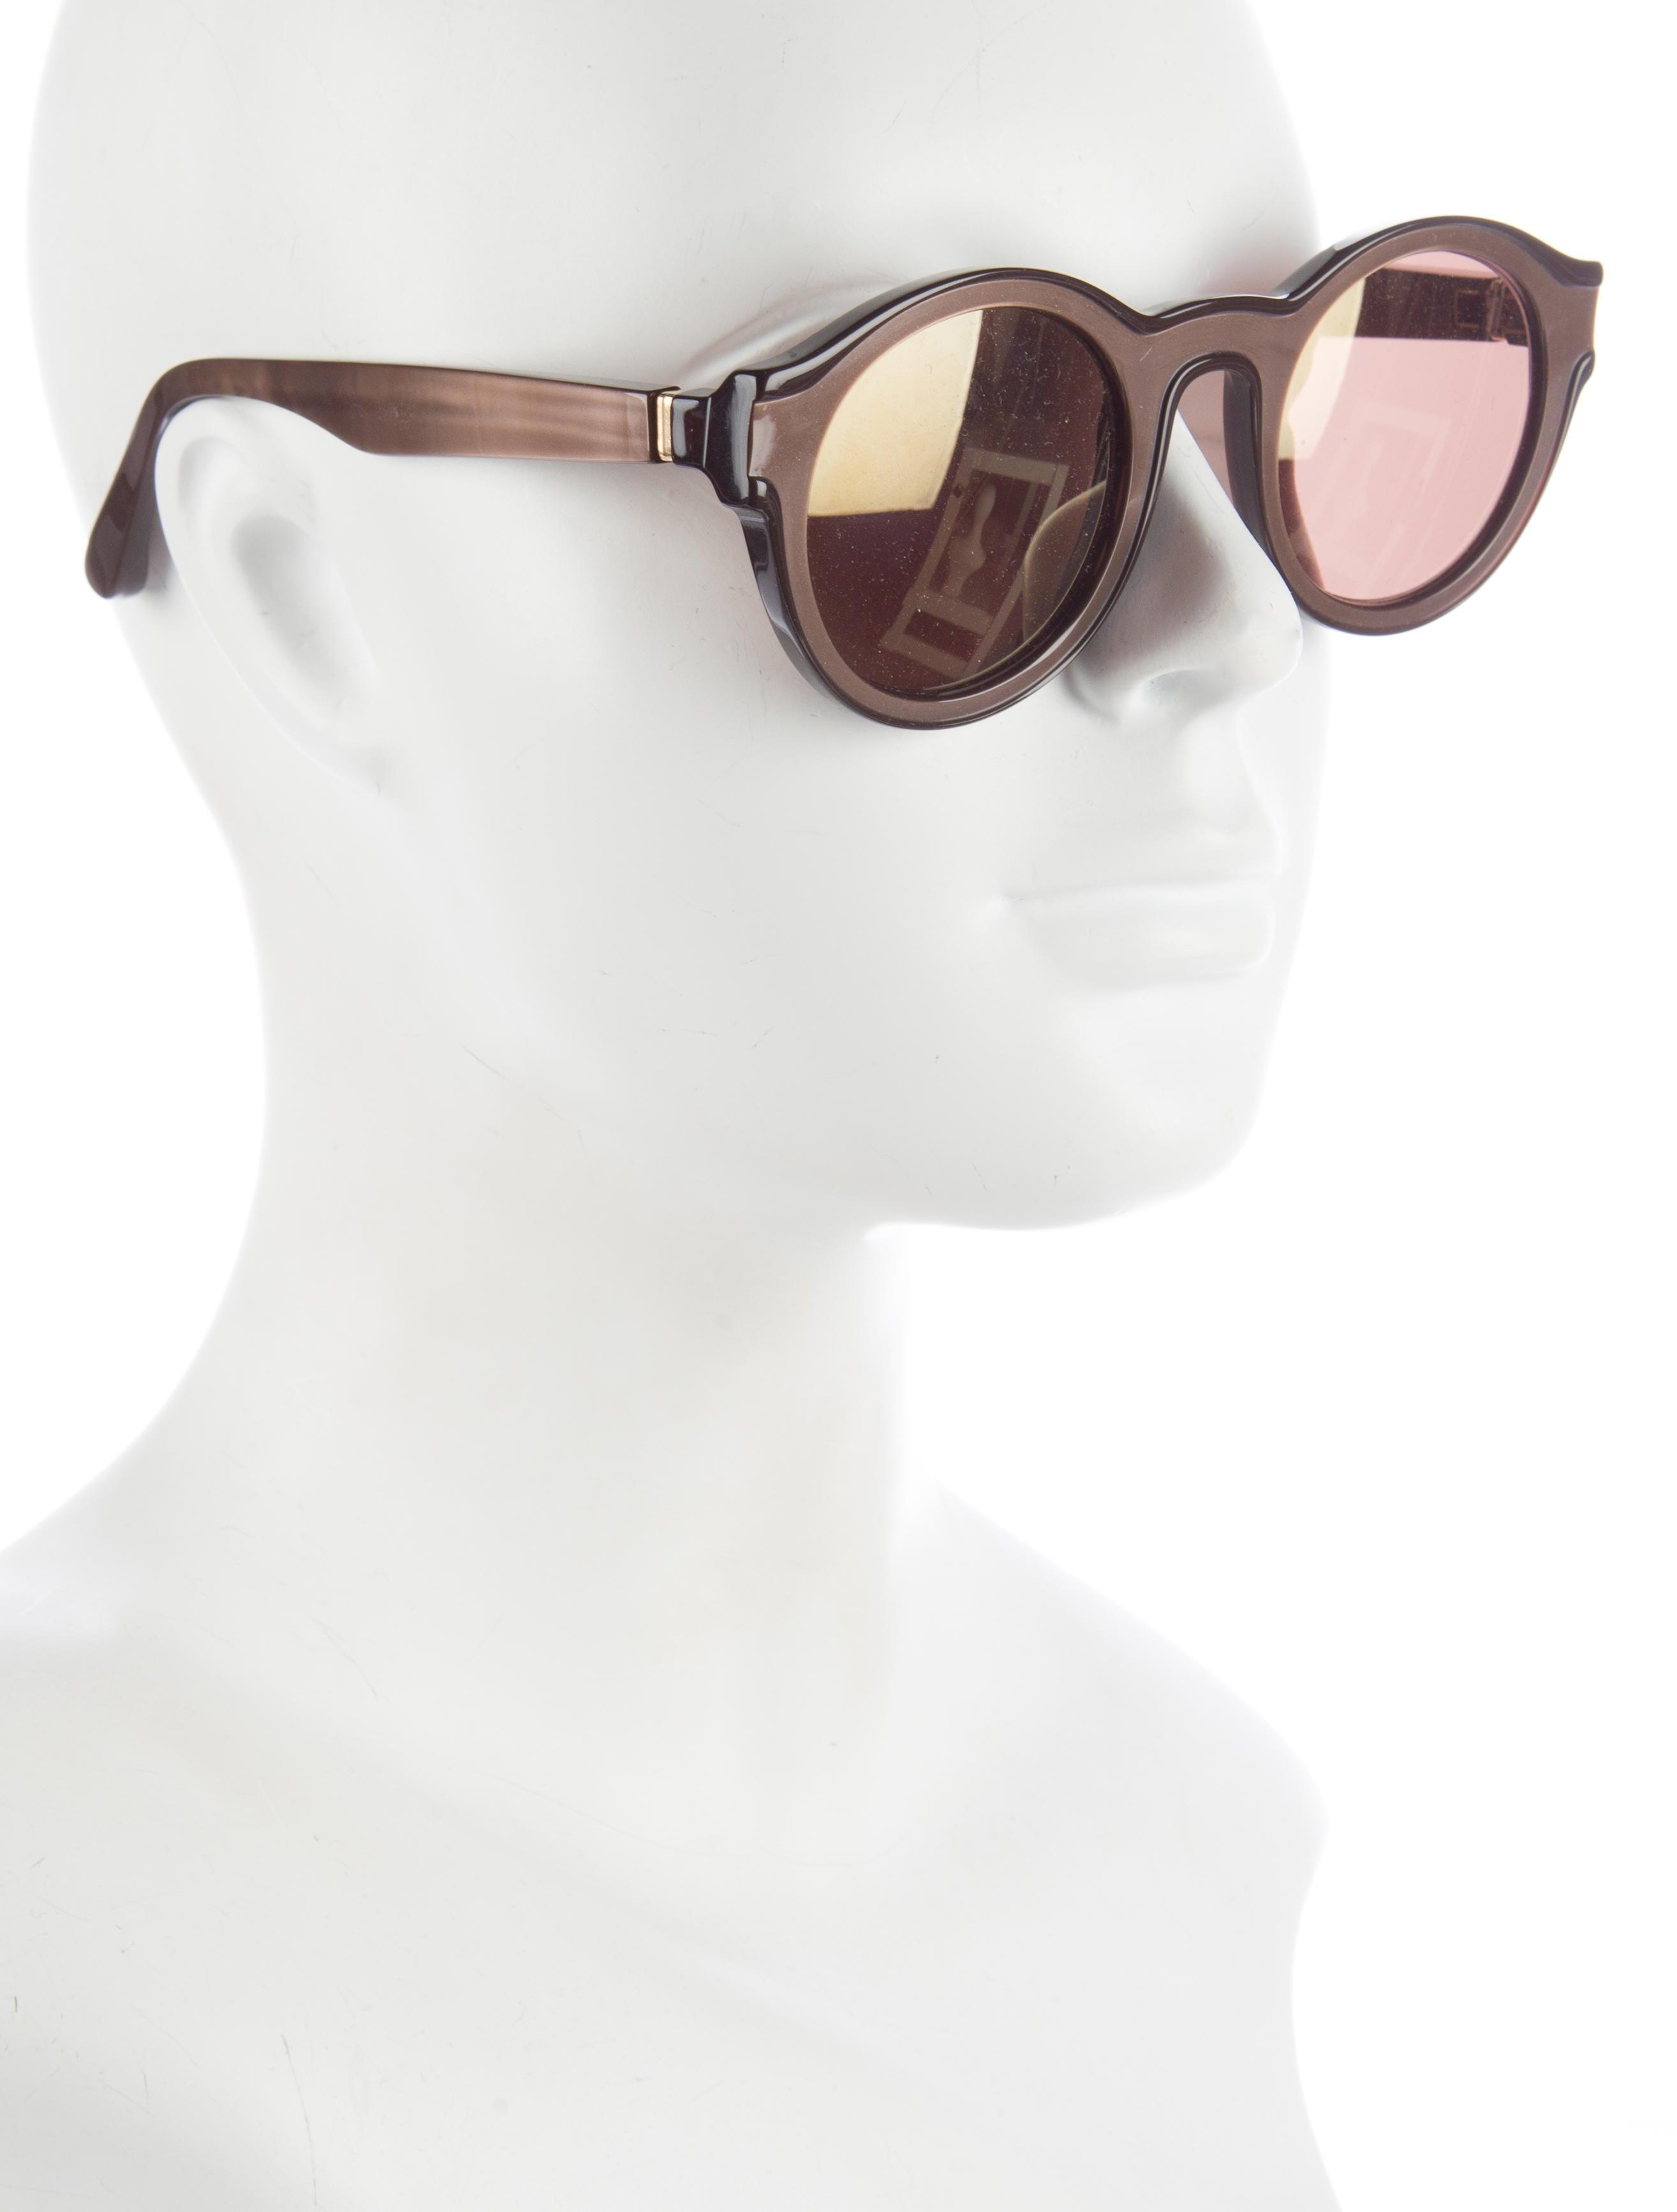 Maison margiela mykita round sunglasses accessories for Martin margiela glasses